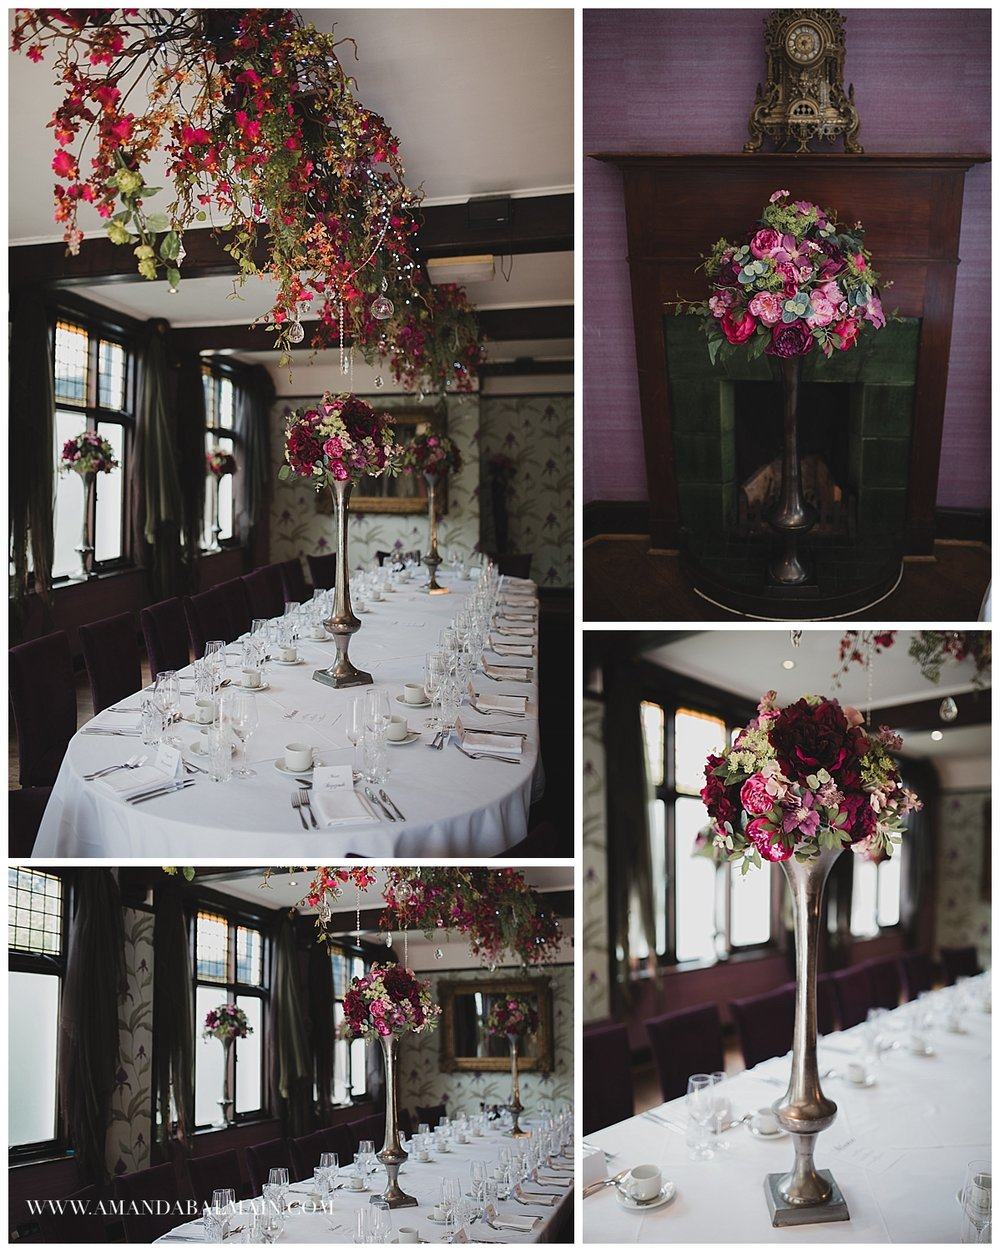 knutsford-wedding-venue